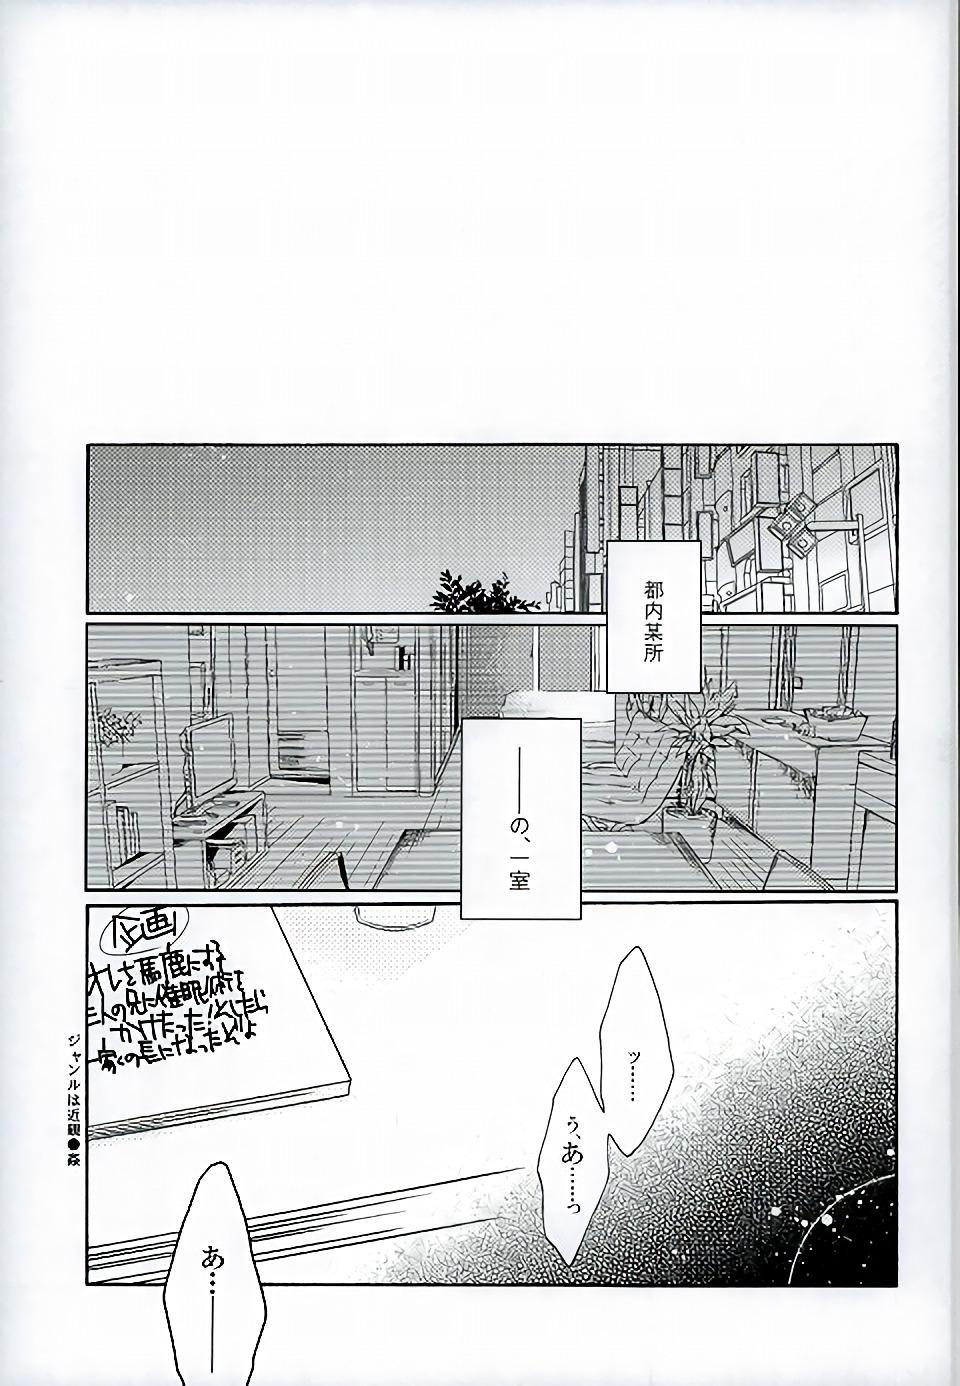 Hatsudori Document 1